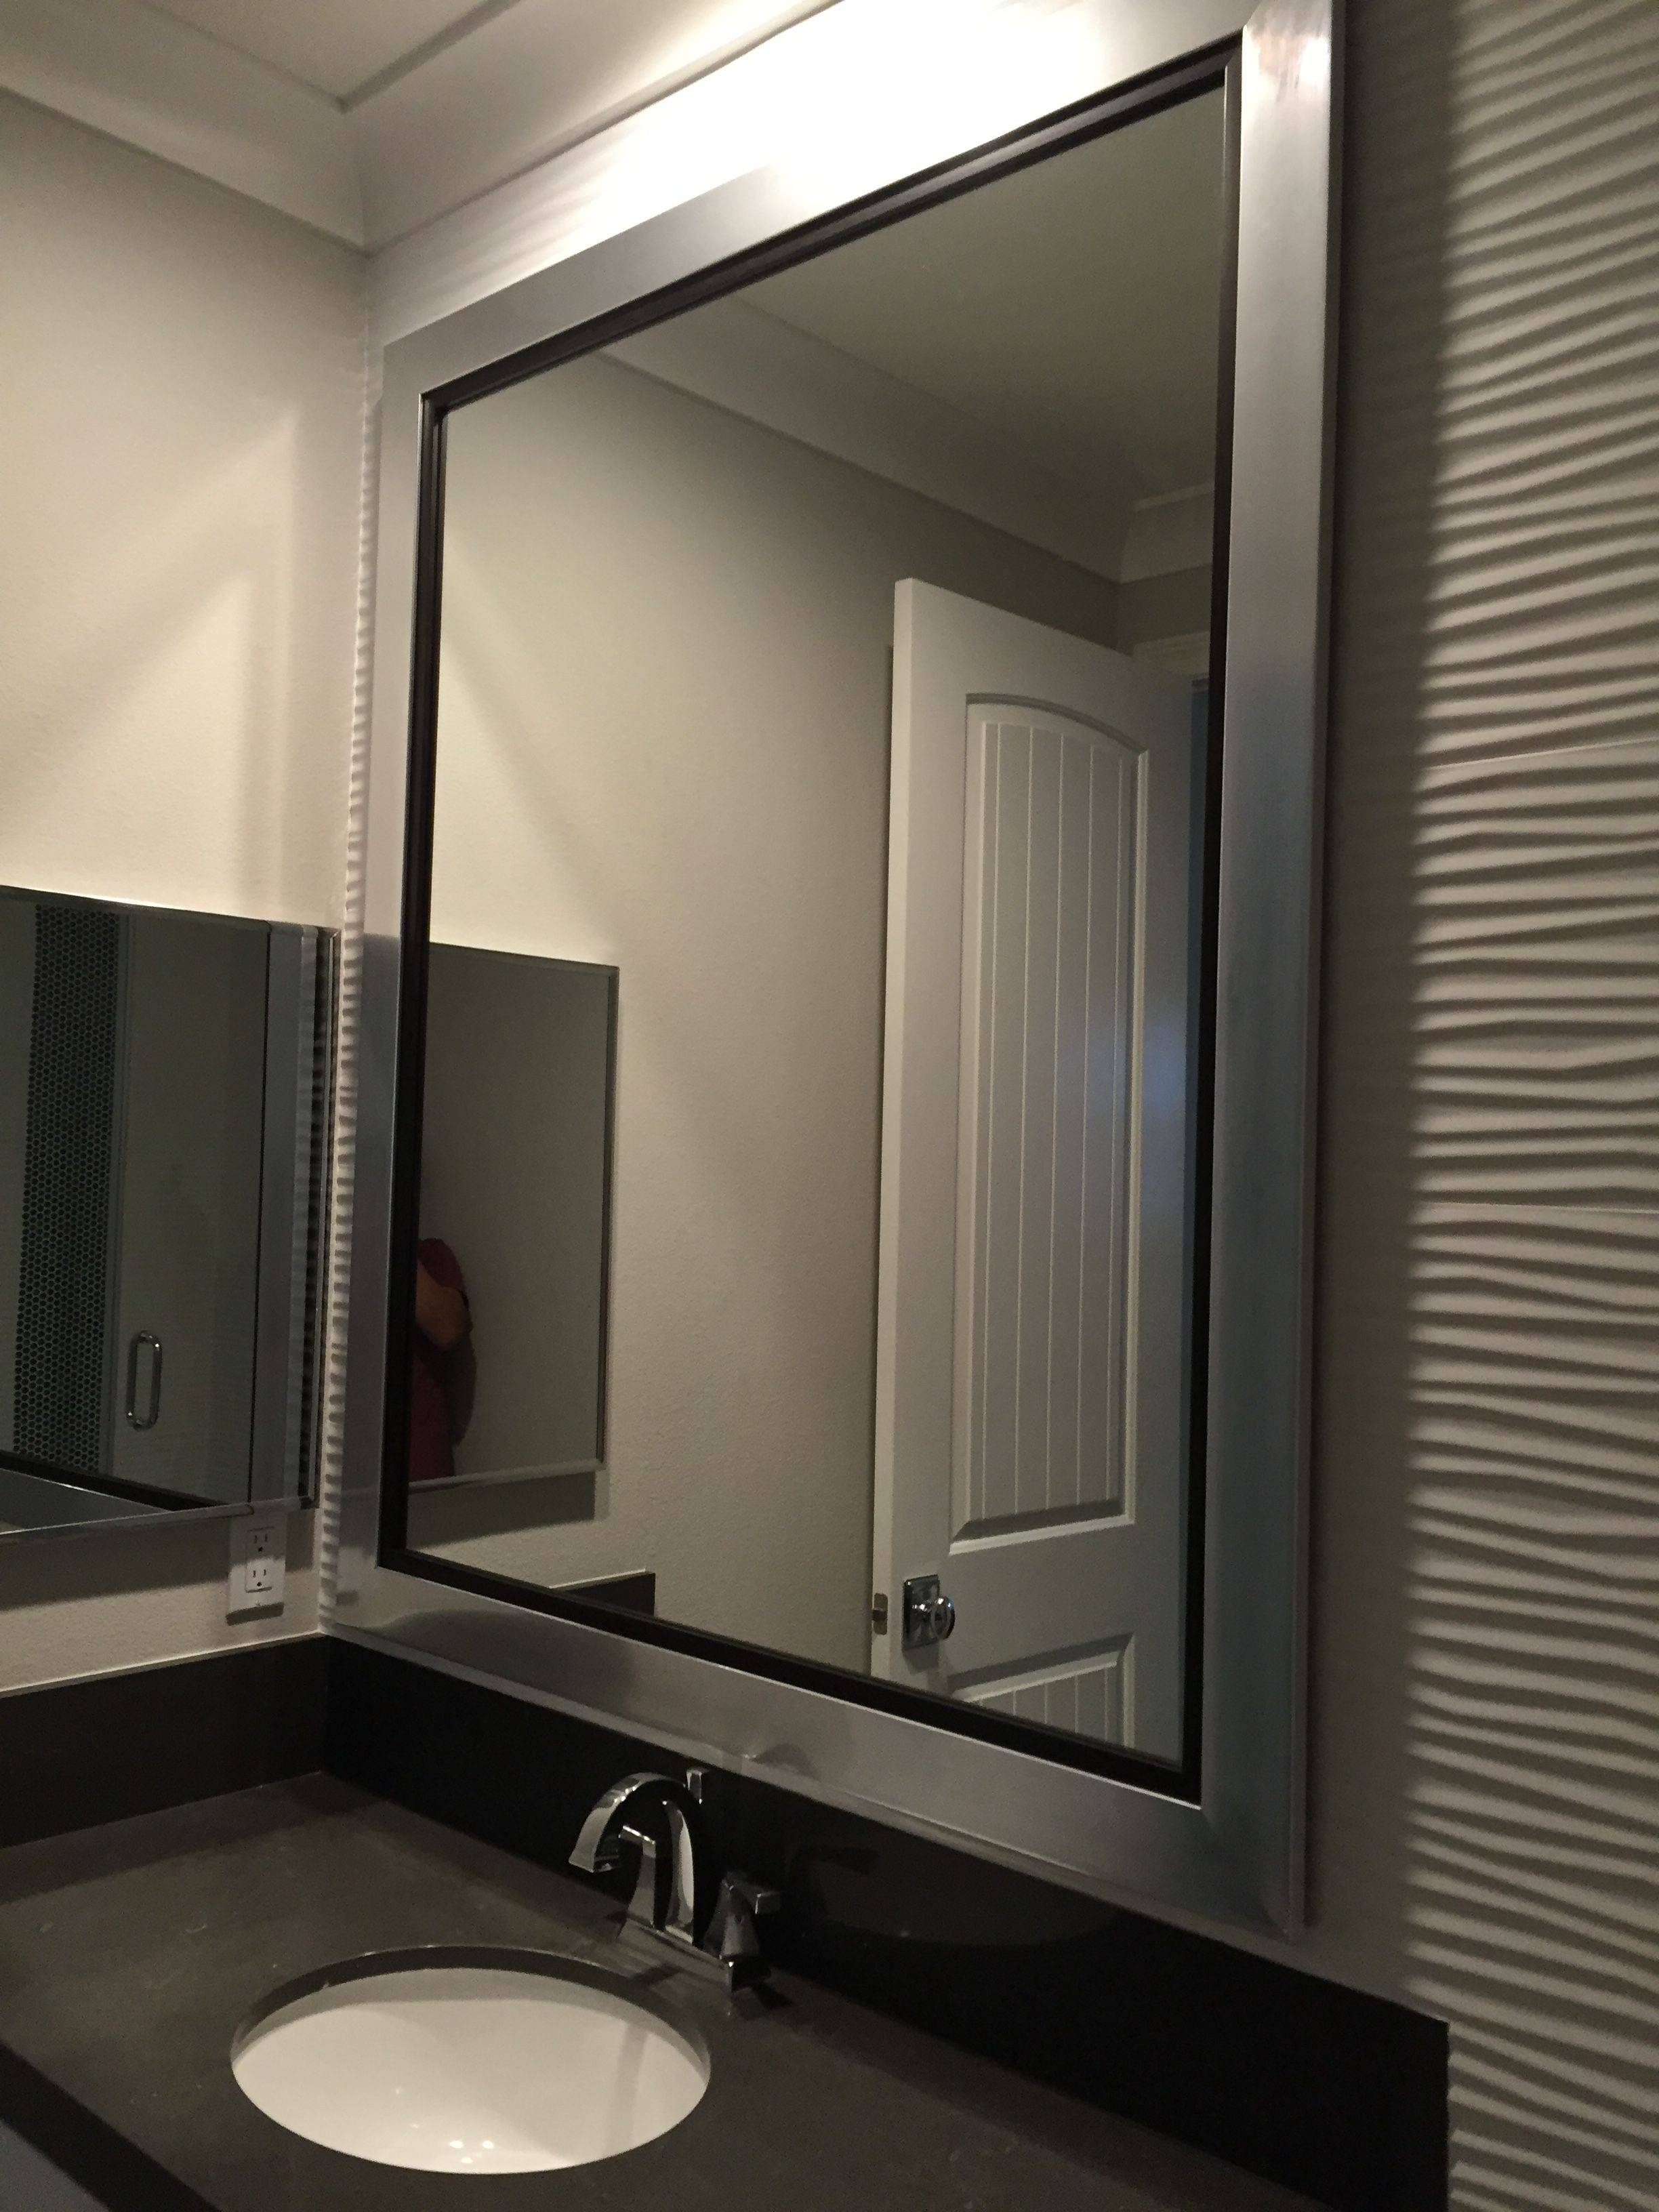 Custom Silver Framed Mirror Bathroom Westframes Silver Framed Mirror Bathroom Mirror Frame Bathroom Mirror